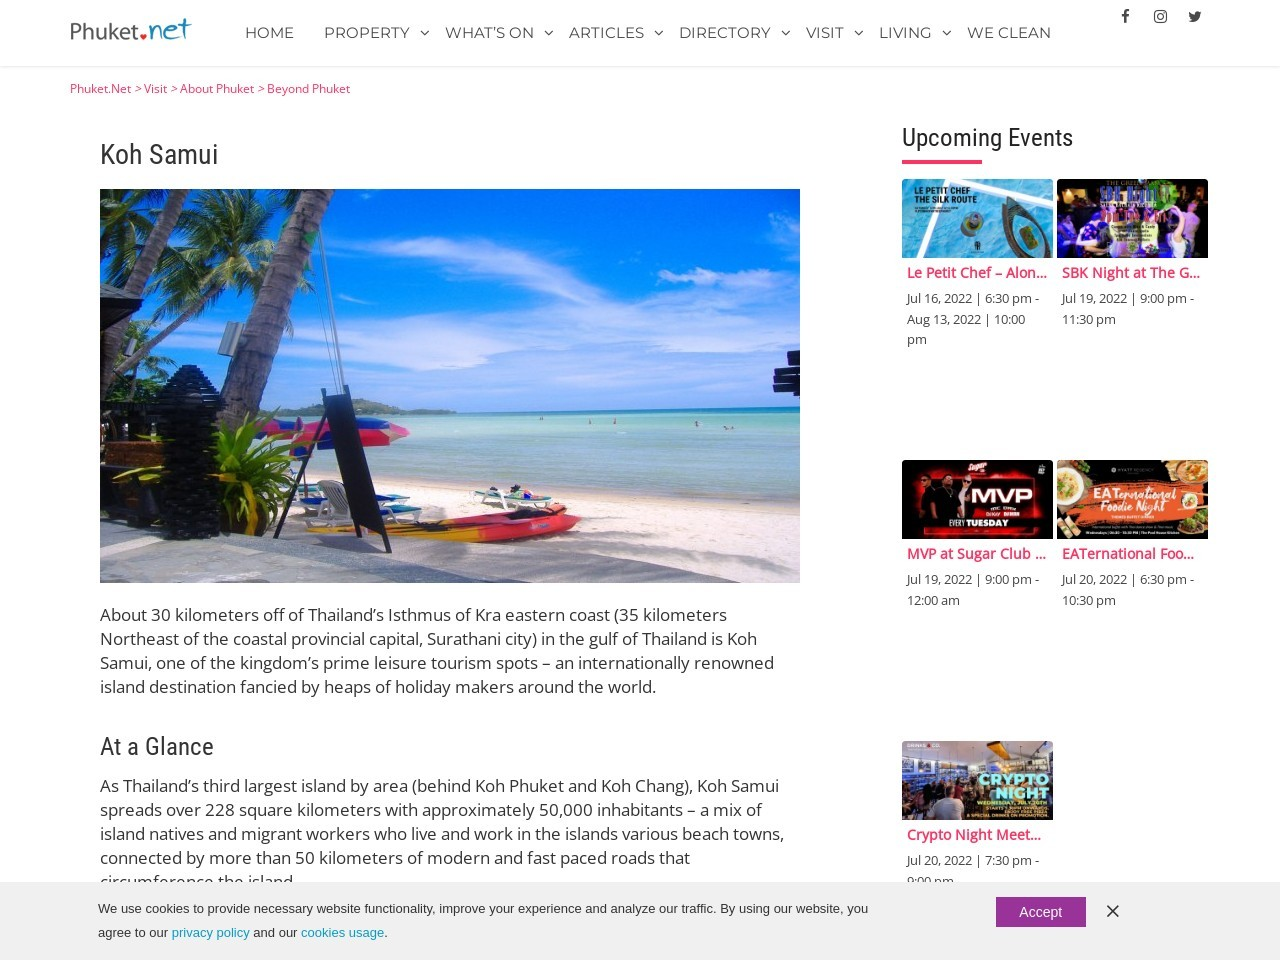 Koh Samui Island - Beyond Phuket - Phuket.Net